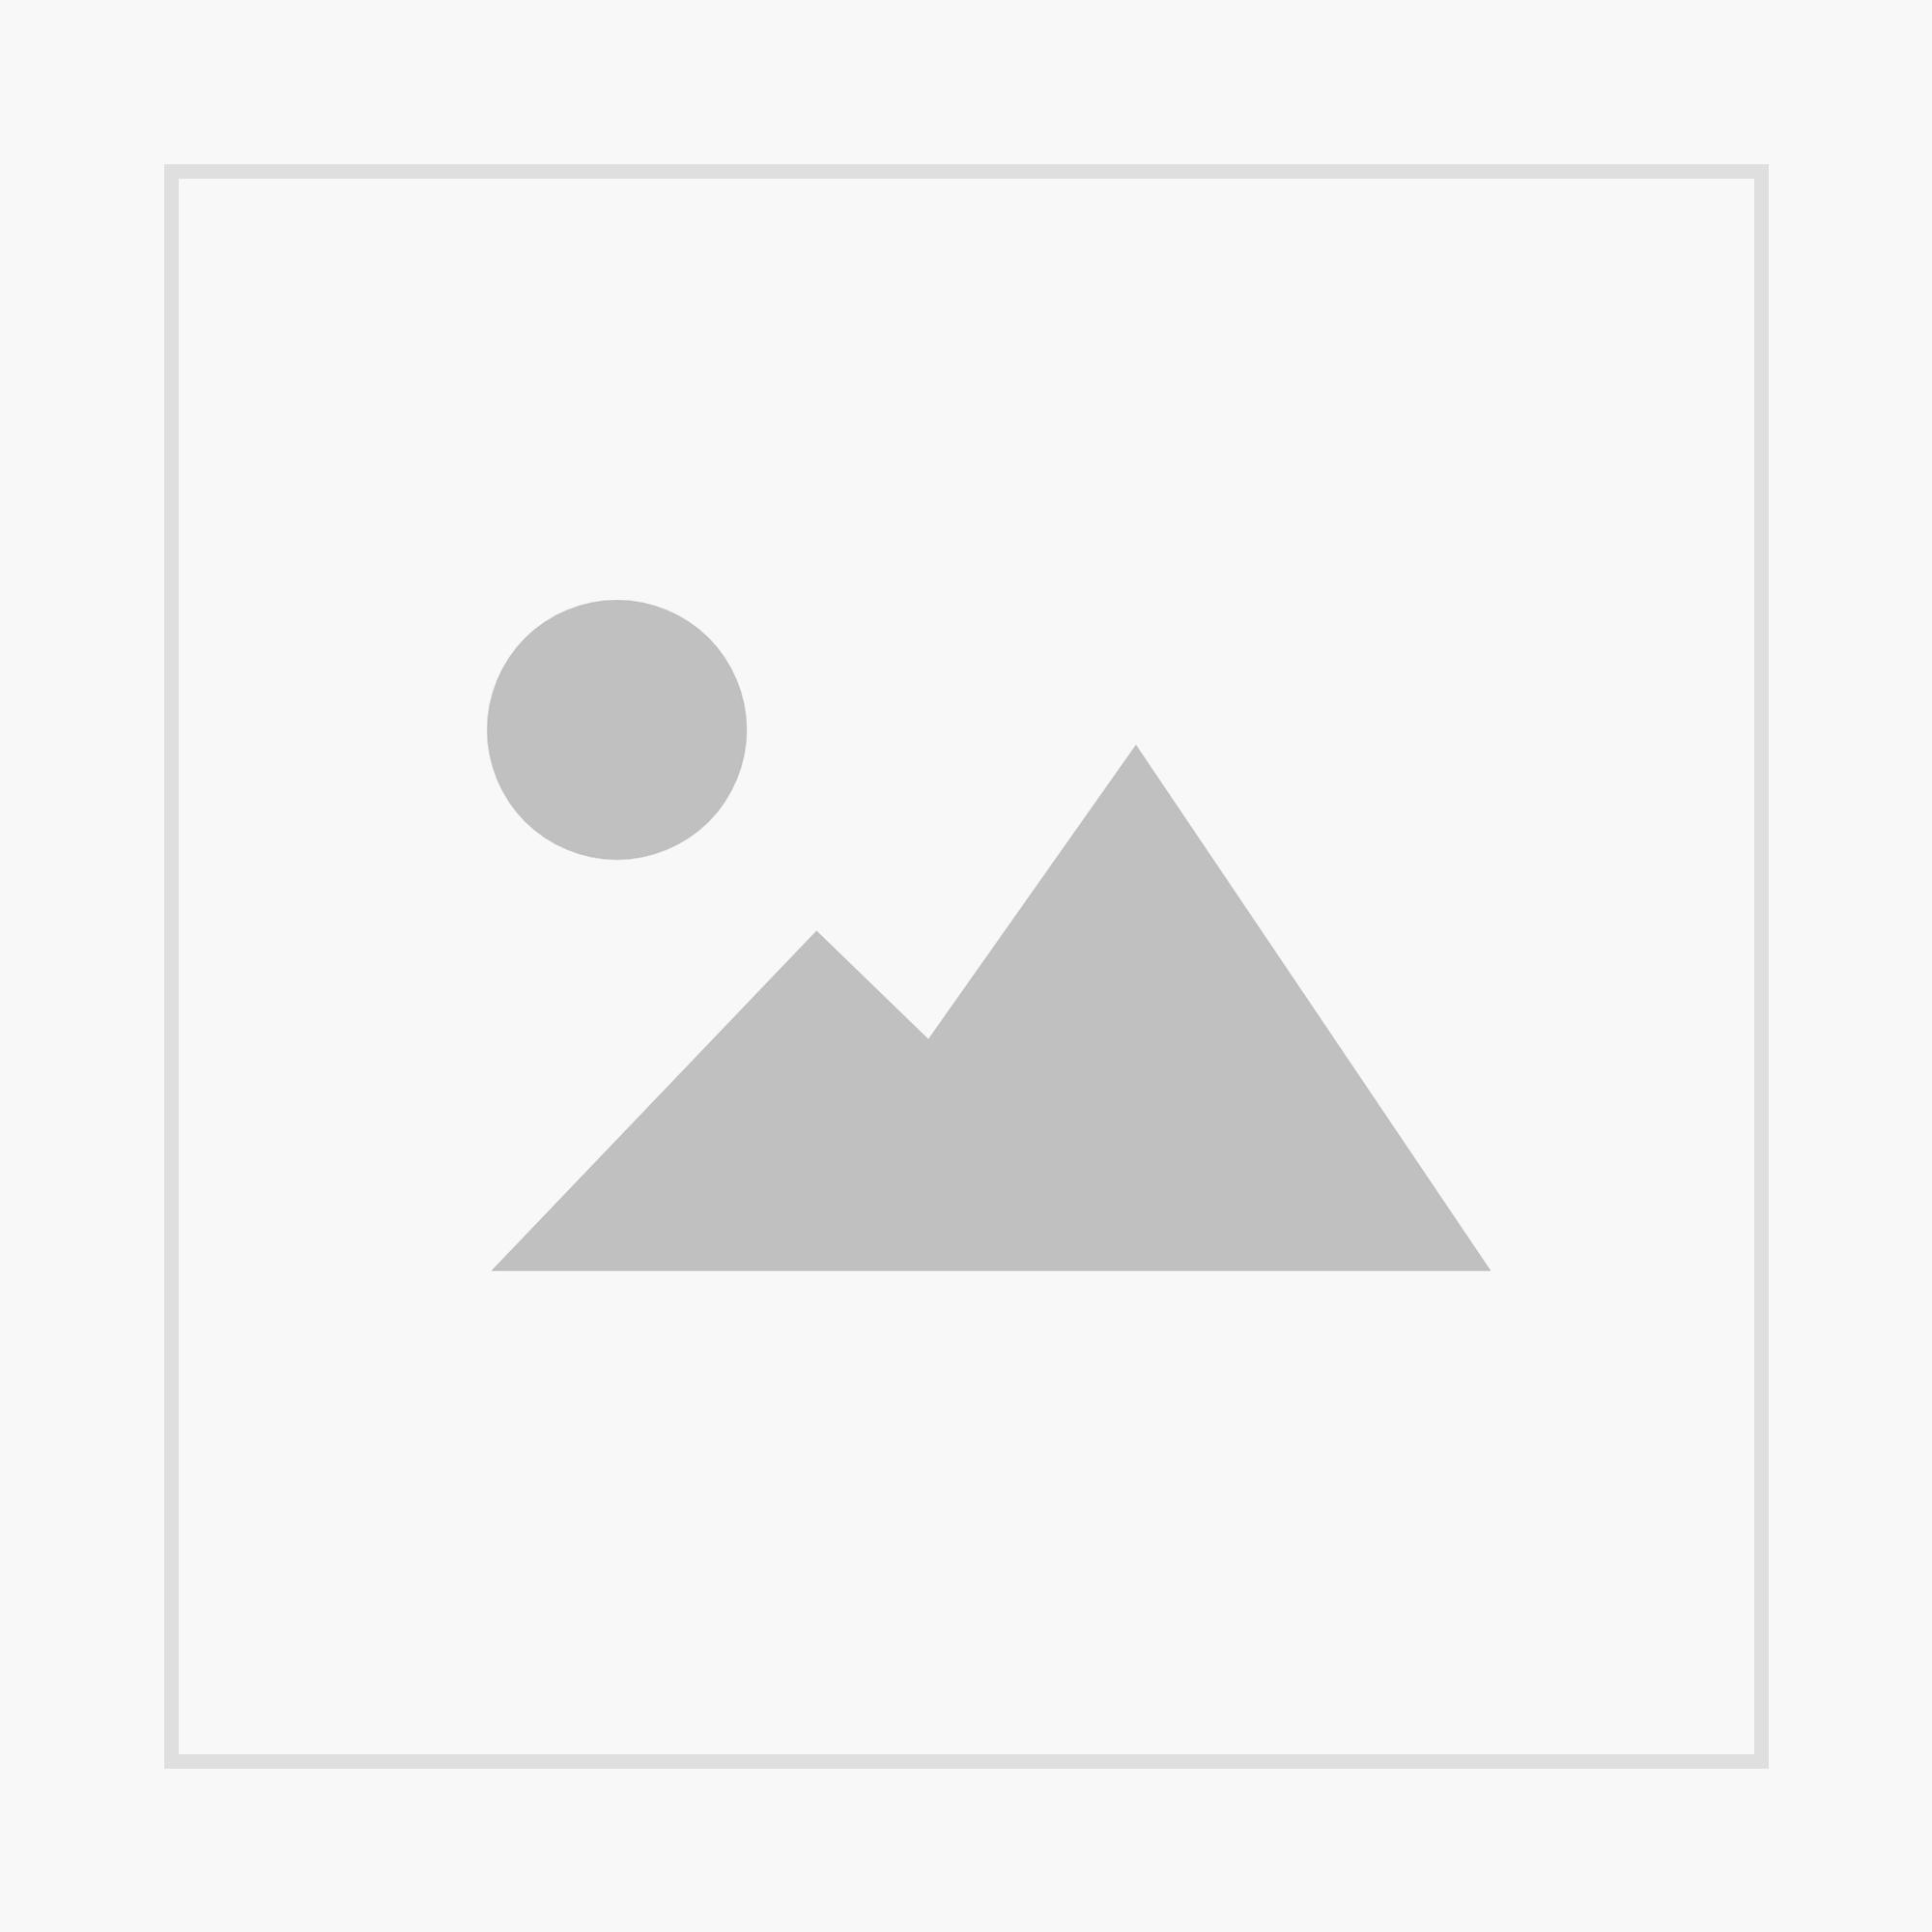 Äpfel - Rezepte aus dem Obstgarten